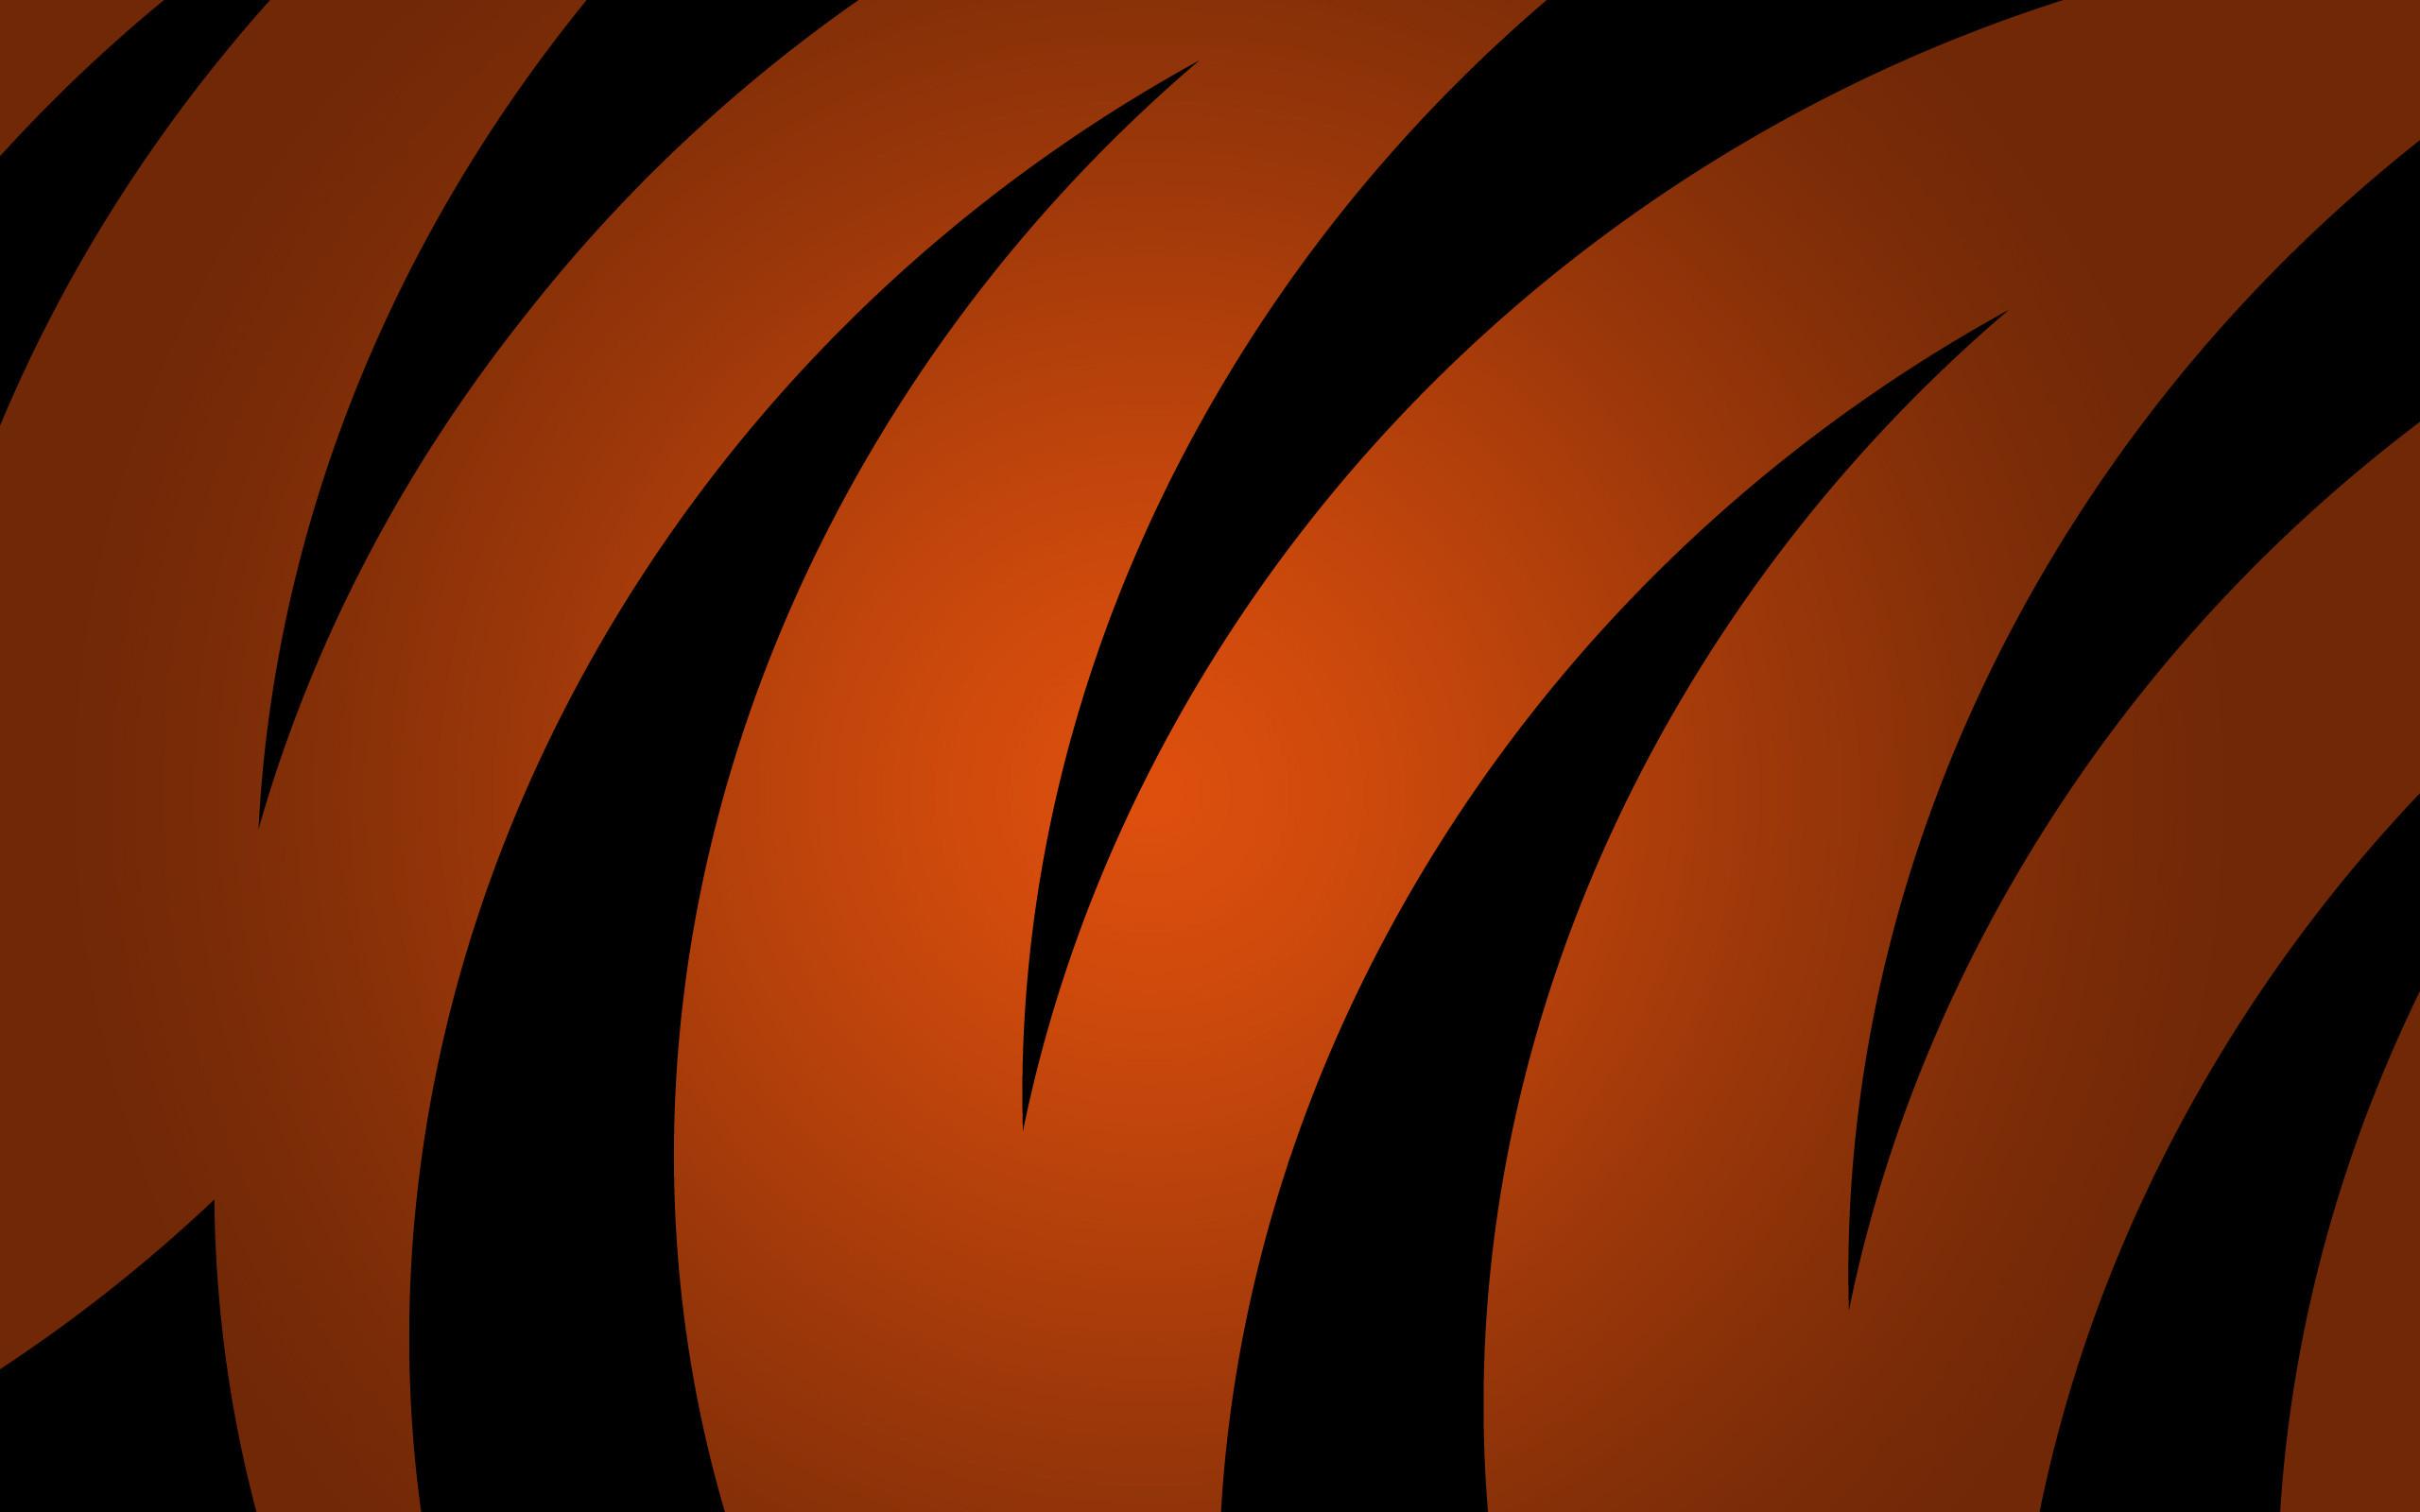 Black and Orange Background HD.